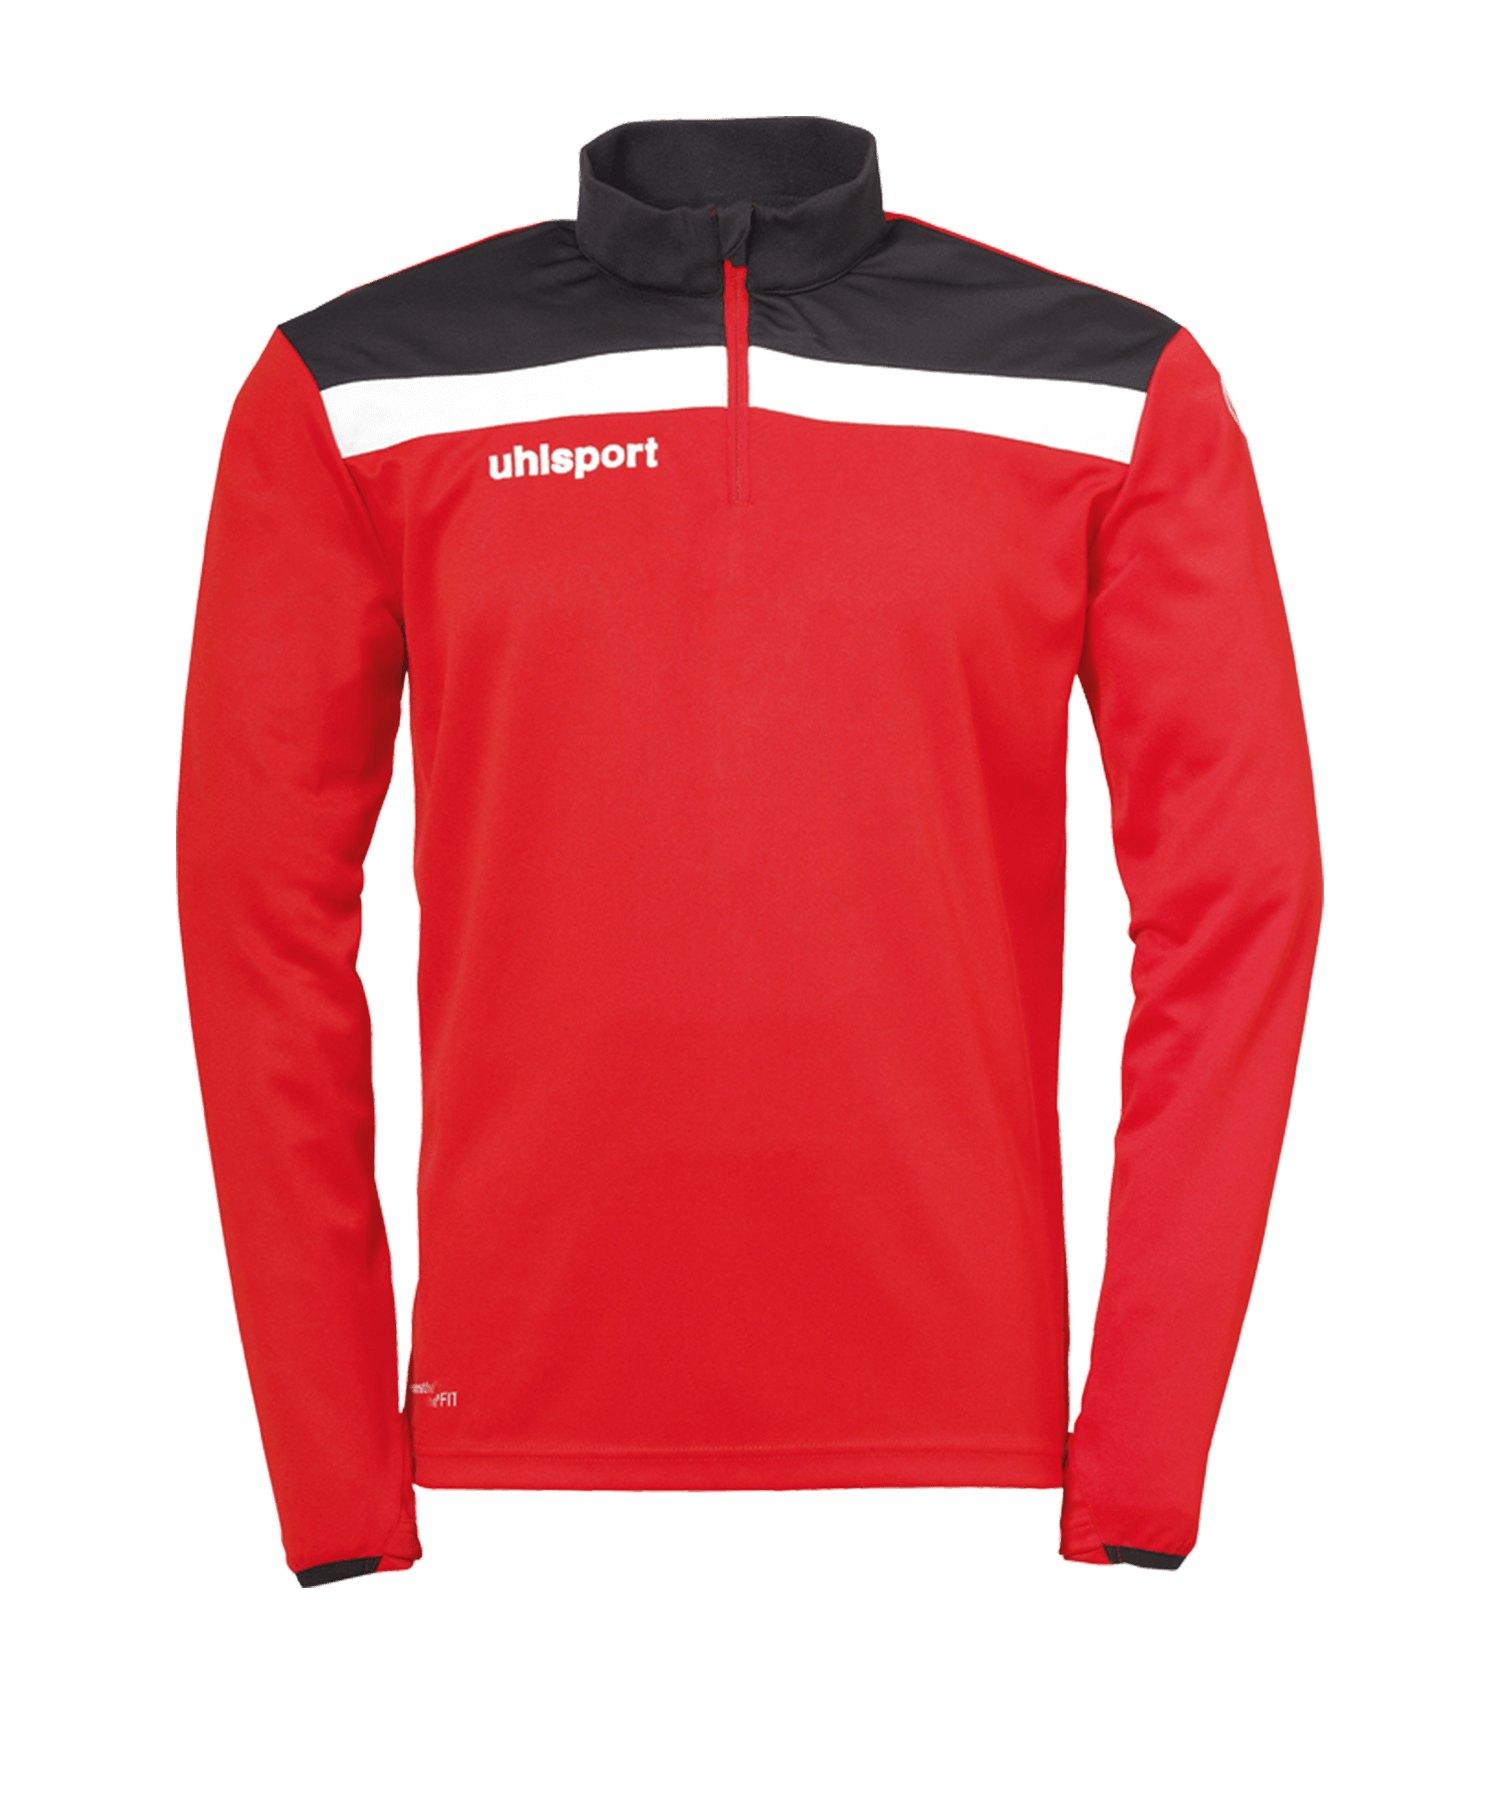 Uhlsport Offense 23 Ziptop Rot Schwarz F04 - rot